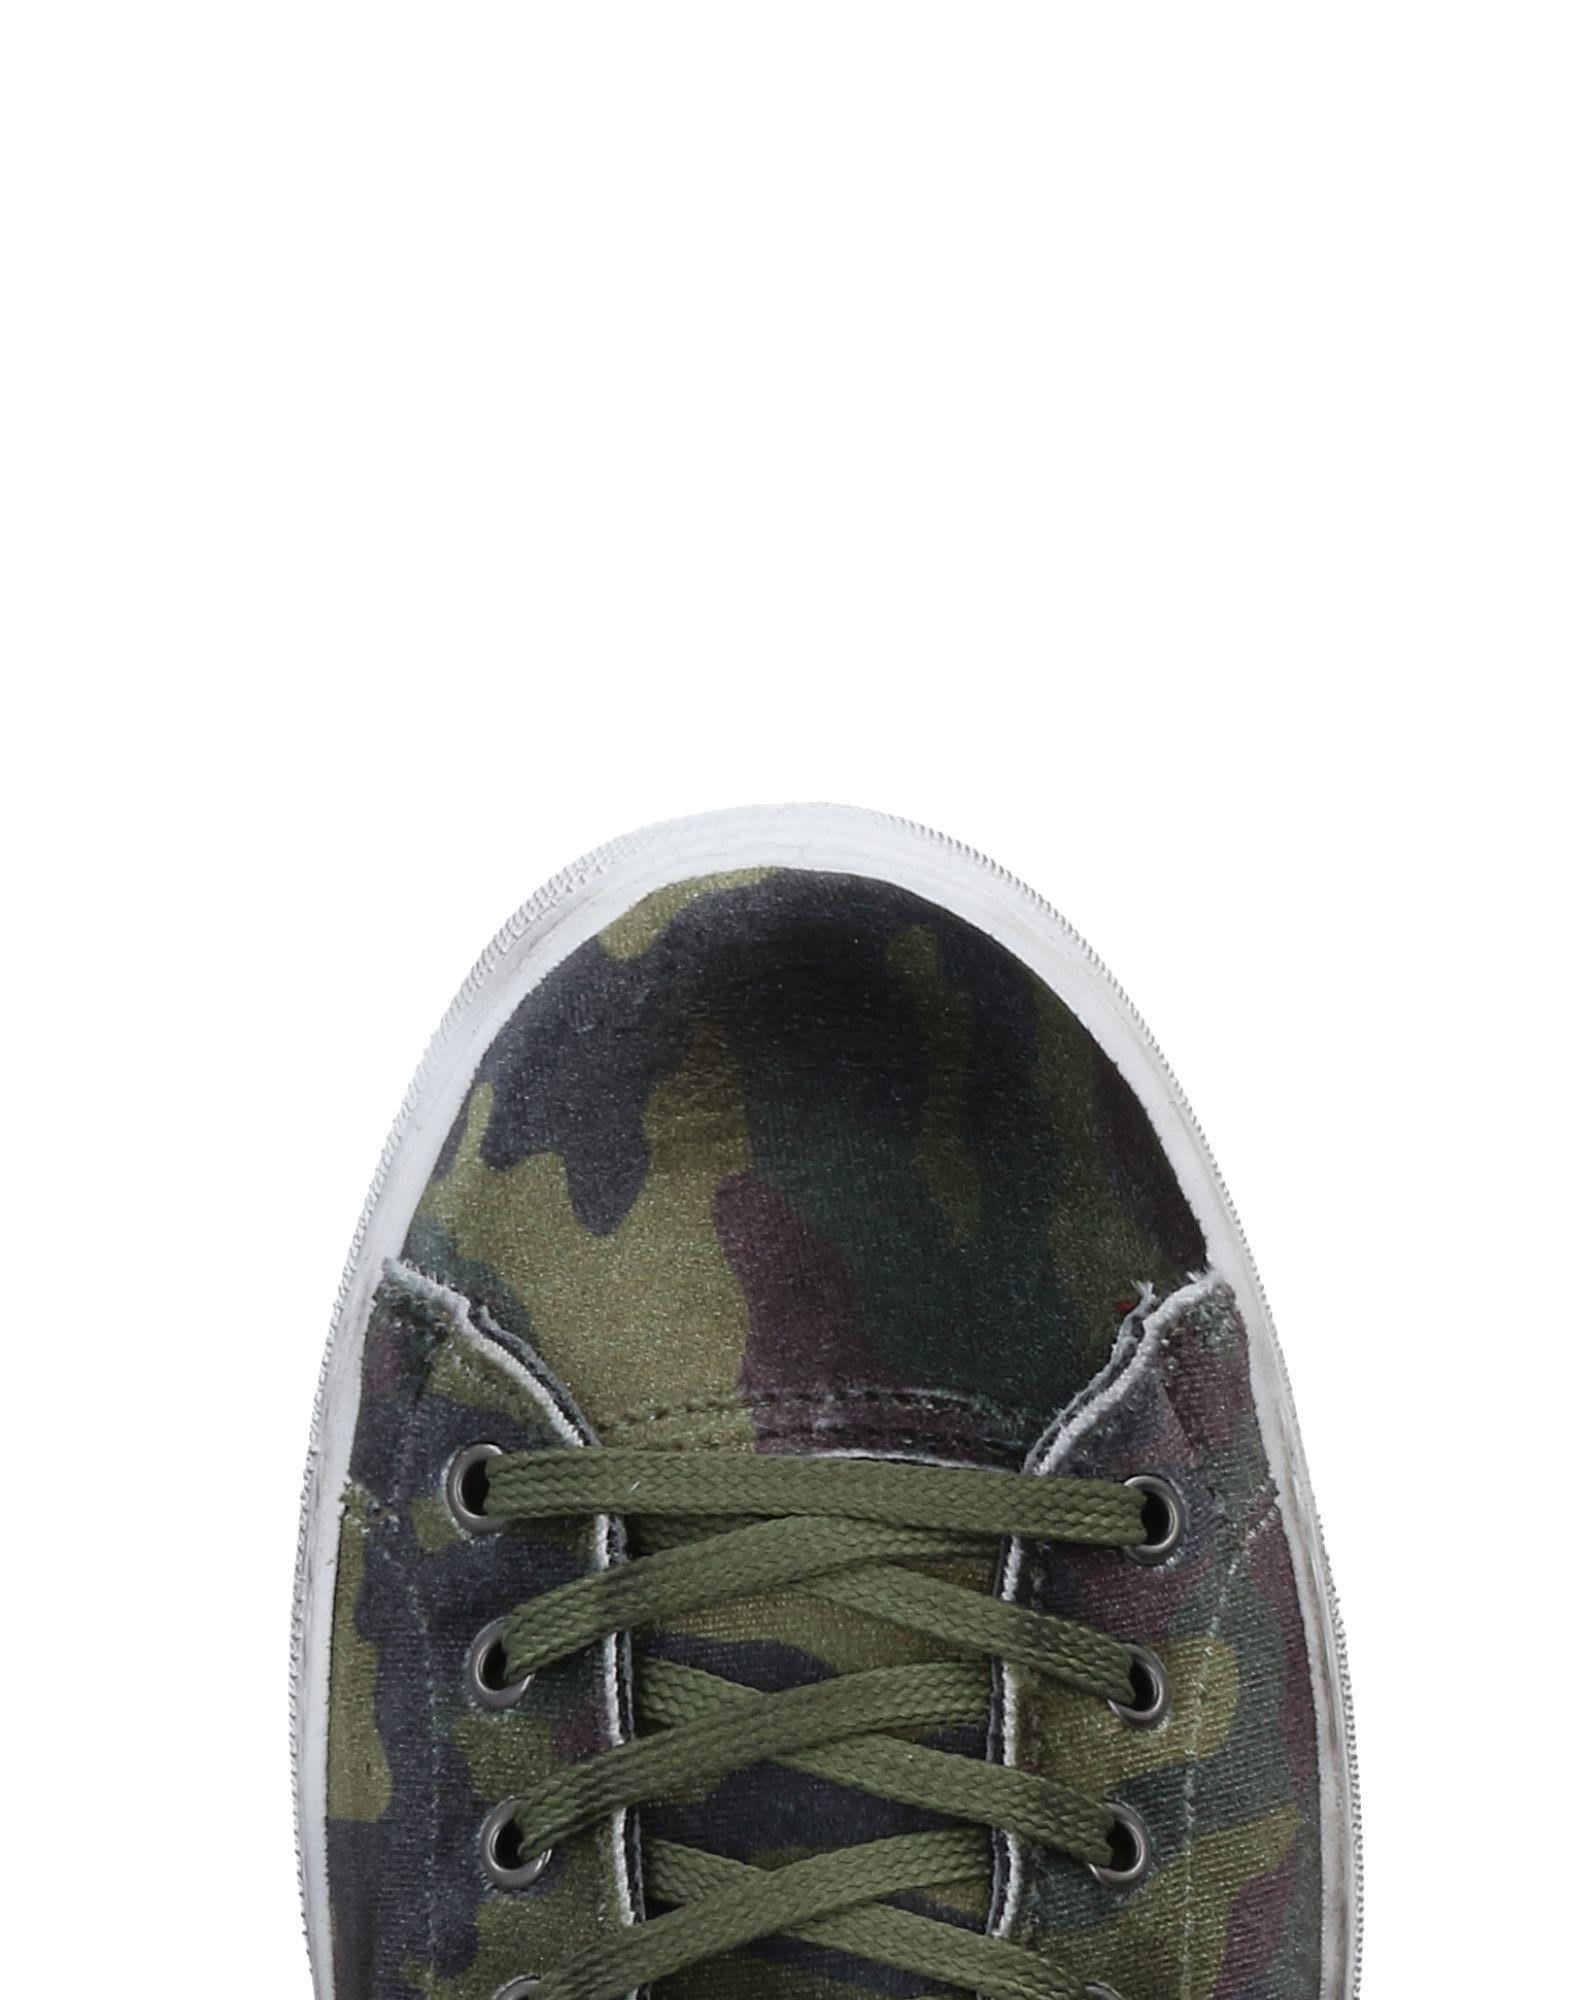 11453484CR 2Star Sneakers Herren  11453484CR  798b47